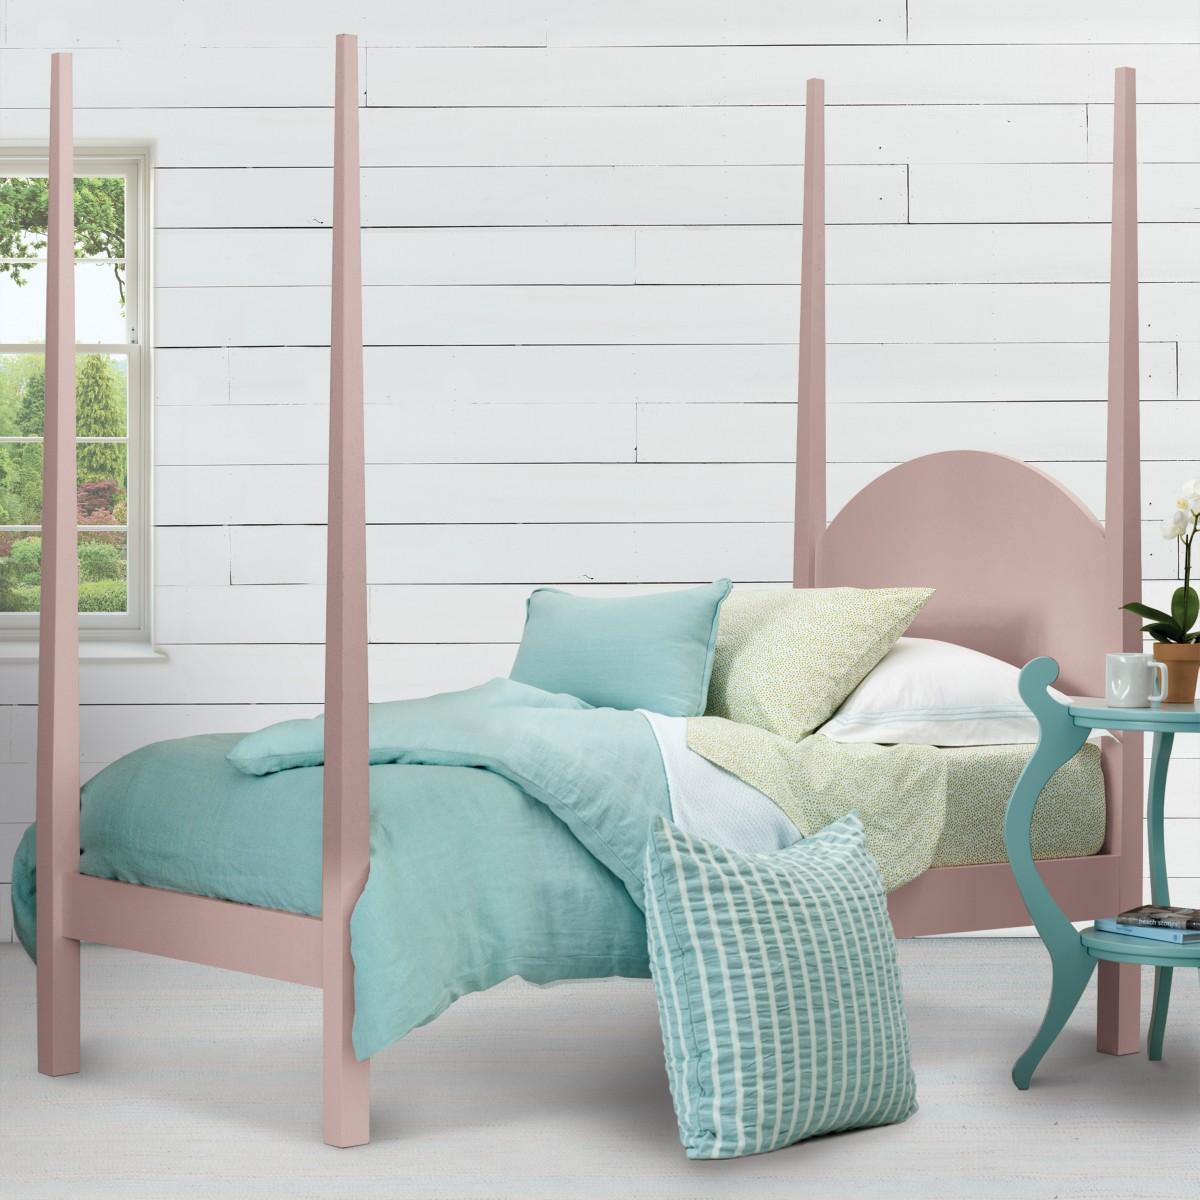 Calvin Twin Bed - Bermuda Beach